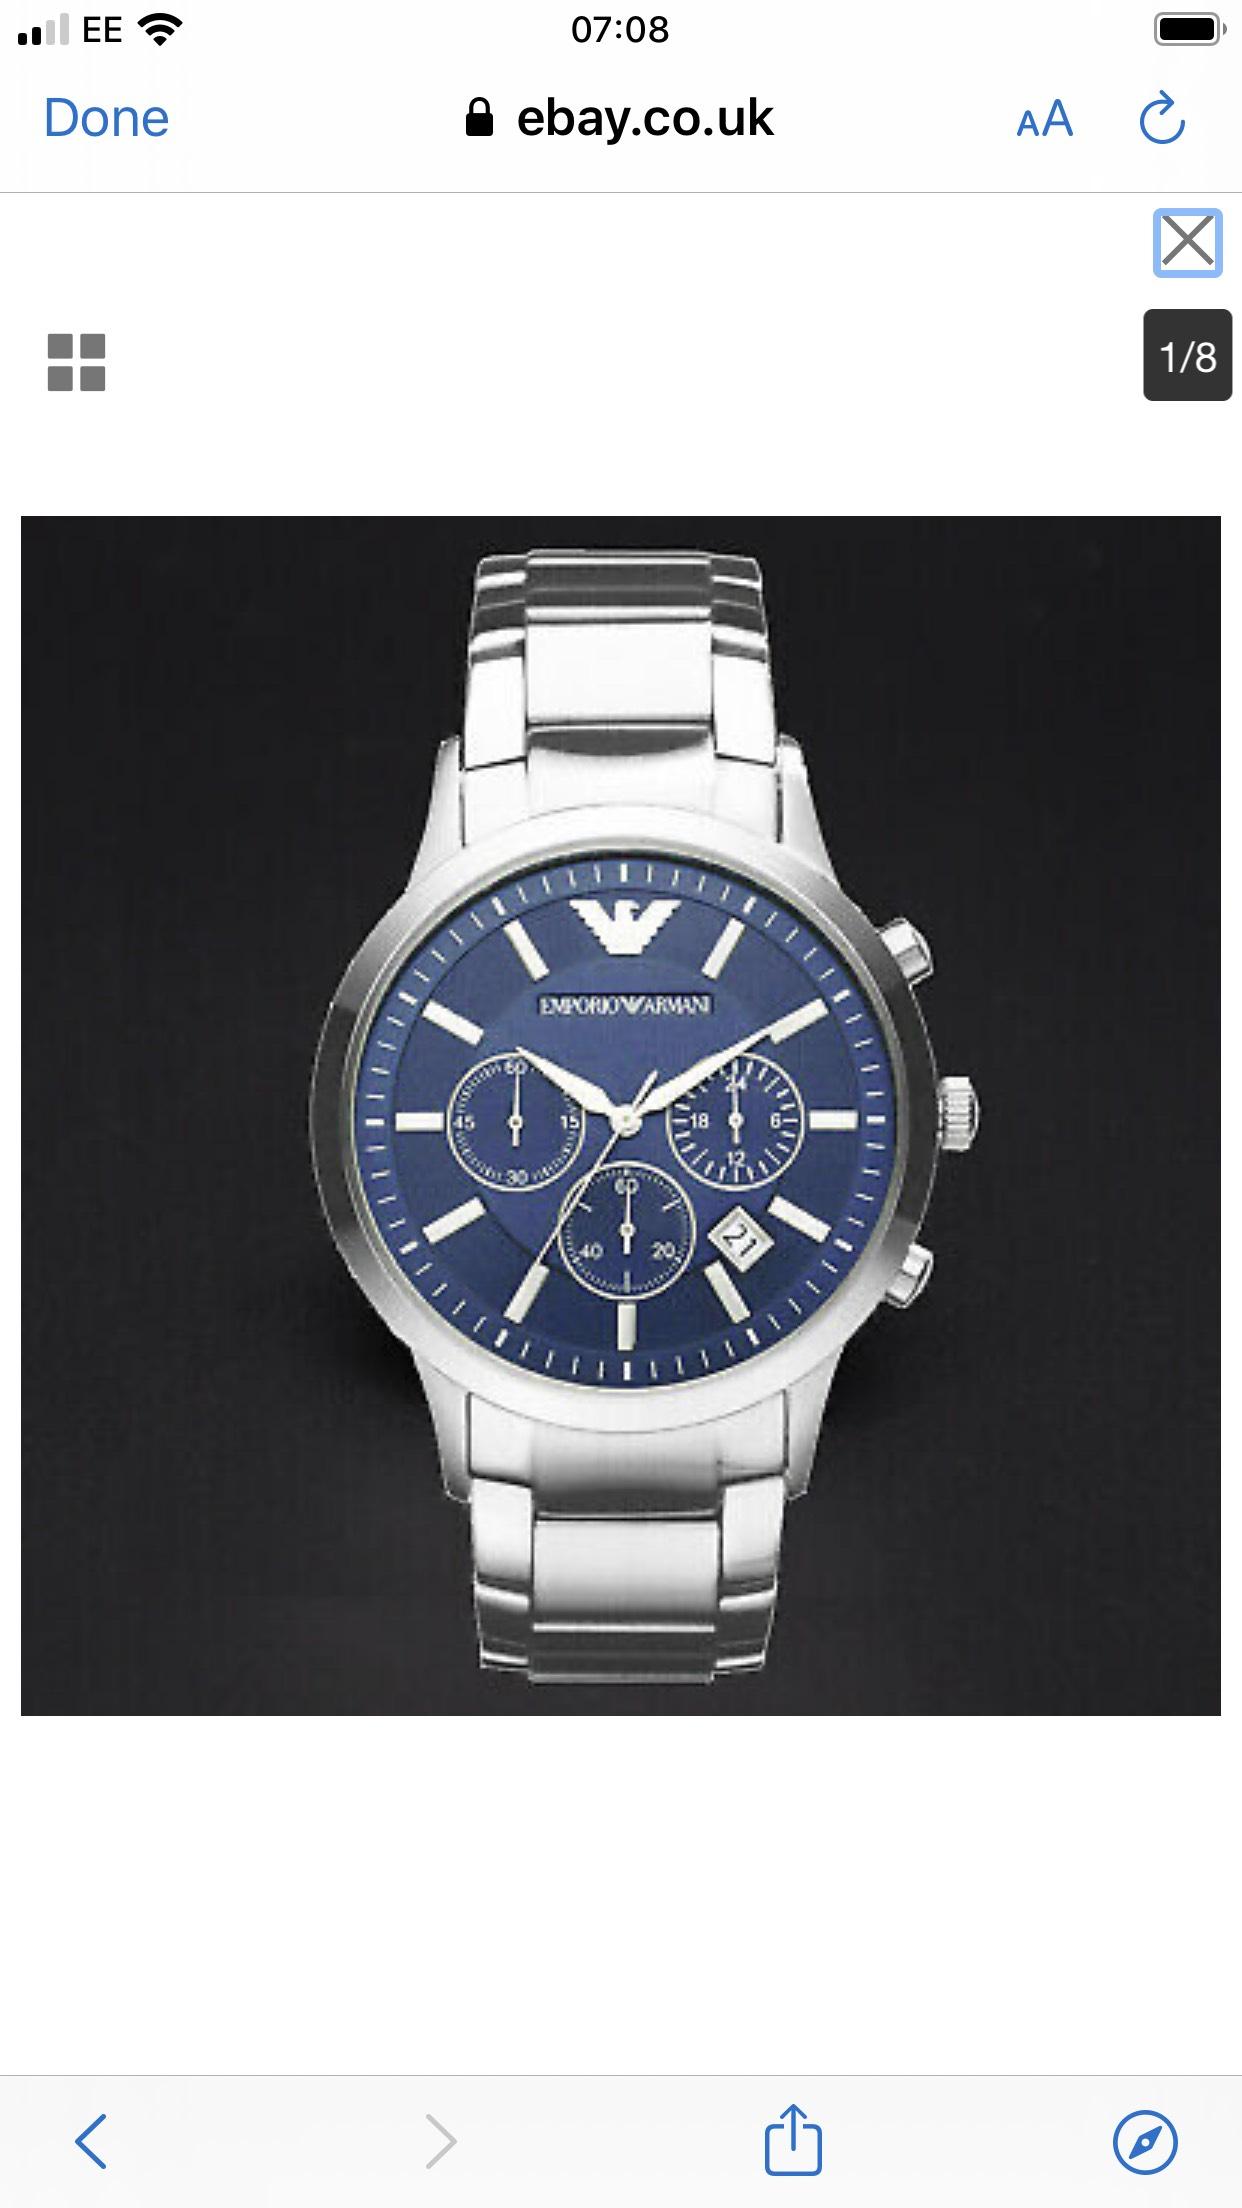 Emporio Armαni AR2448 Watch Quartz Men's Silver Steel Blue Dial 5 Year Warranty £49.99 + free delivery @ Ebay / beyblade_burst